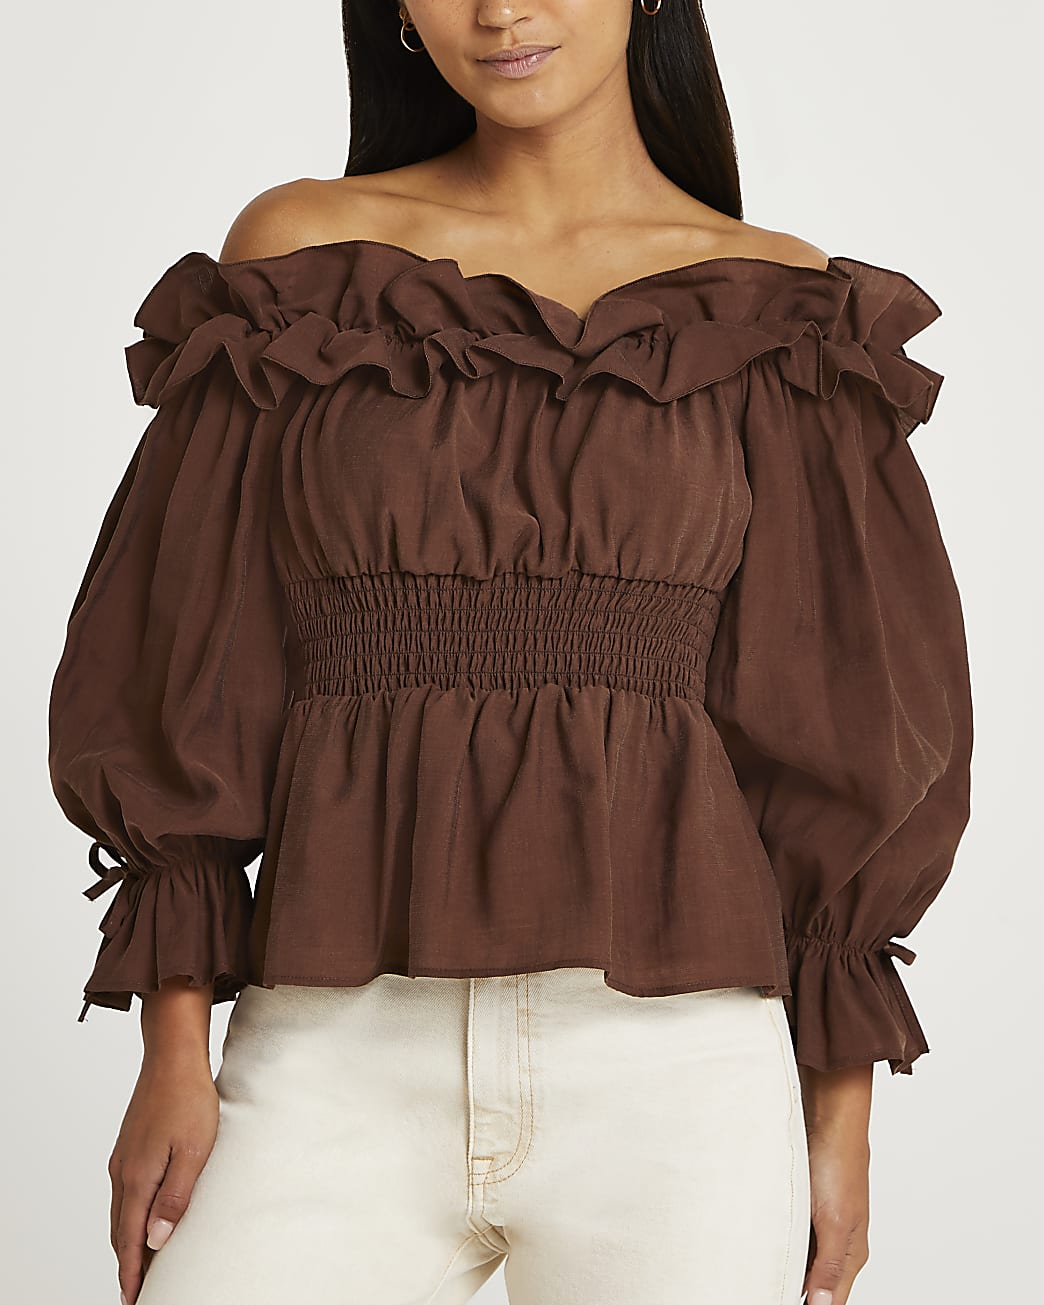 Petite brown ruffled bardot top